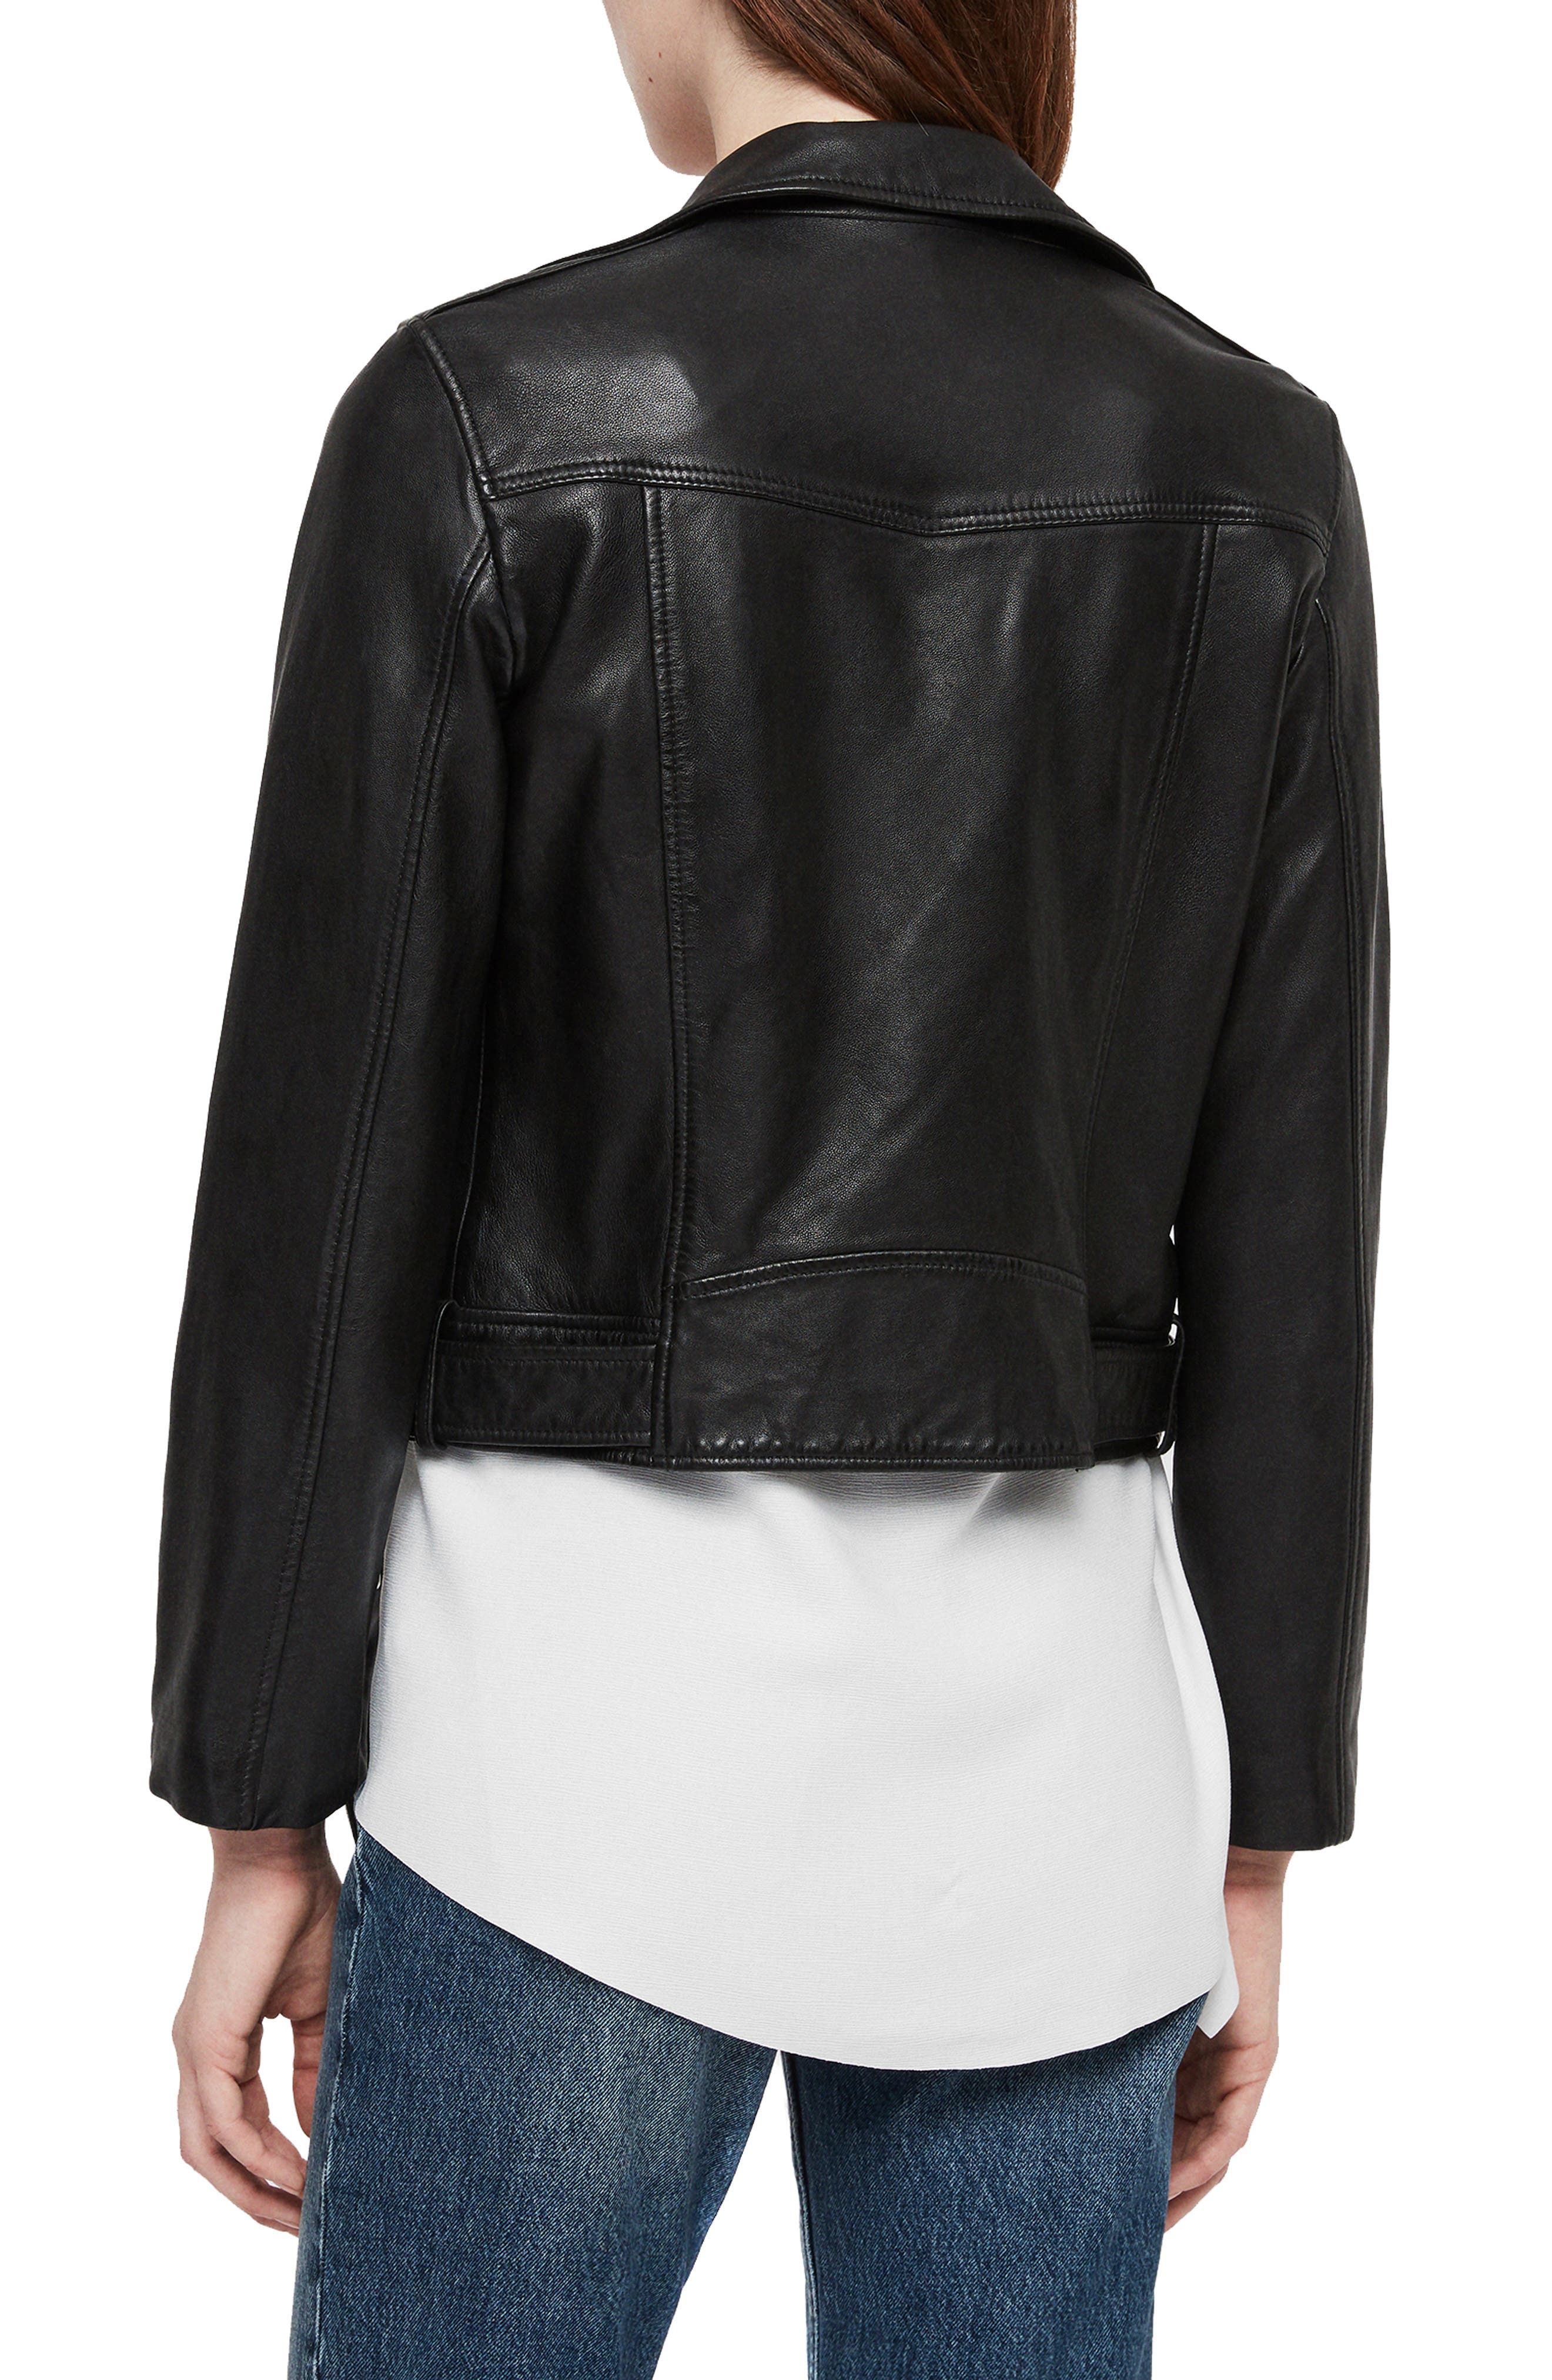 Juno Leather Biker Jacket,                             Alternate thumbnail 2, color,                             BLACK